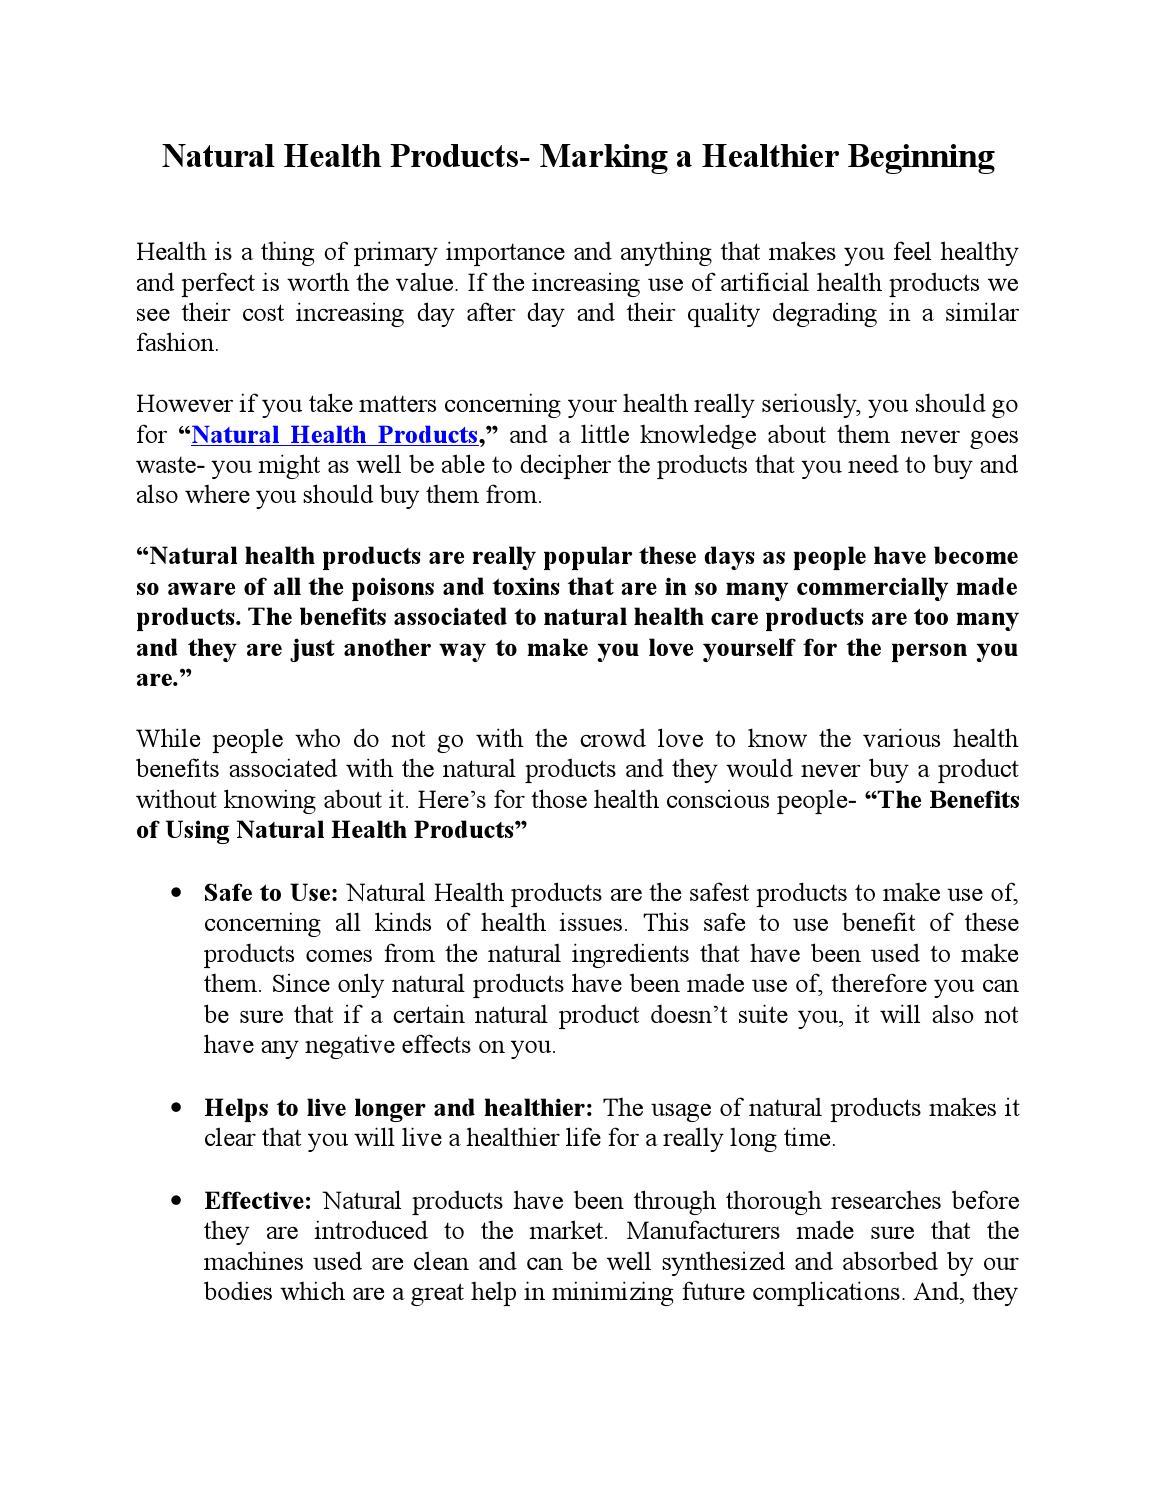 Enticing Health Marking A Healthier Beginning By John Venes Issuu Health Marking A Healthier Beginning By John Venes Health Products Benefit Walgreens inspiration Health Products Benefit